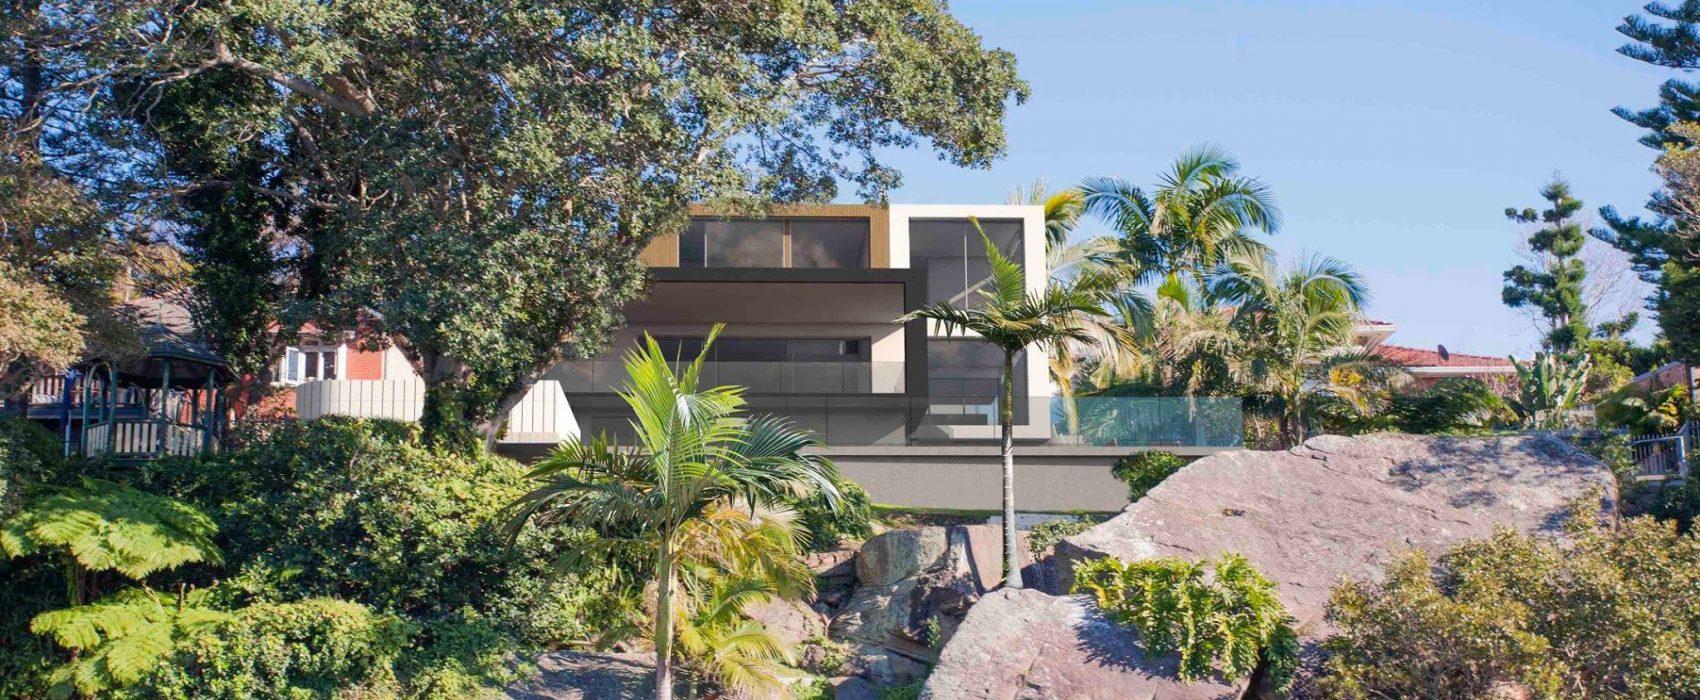 Modern Harbour Architects, Sydney Architectural Design